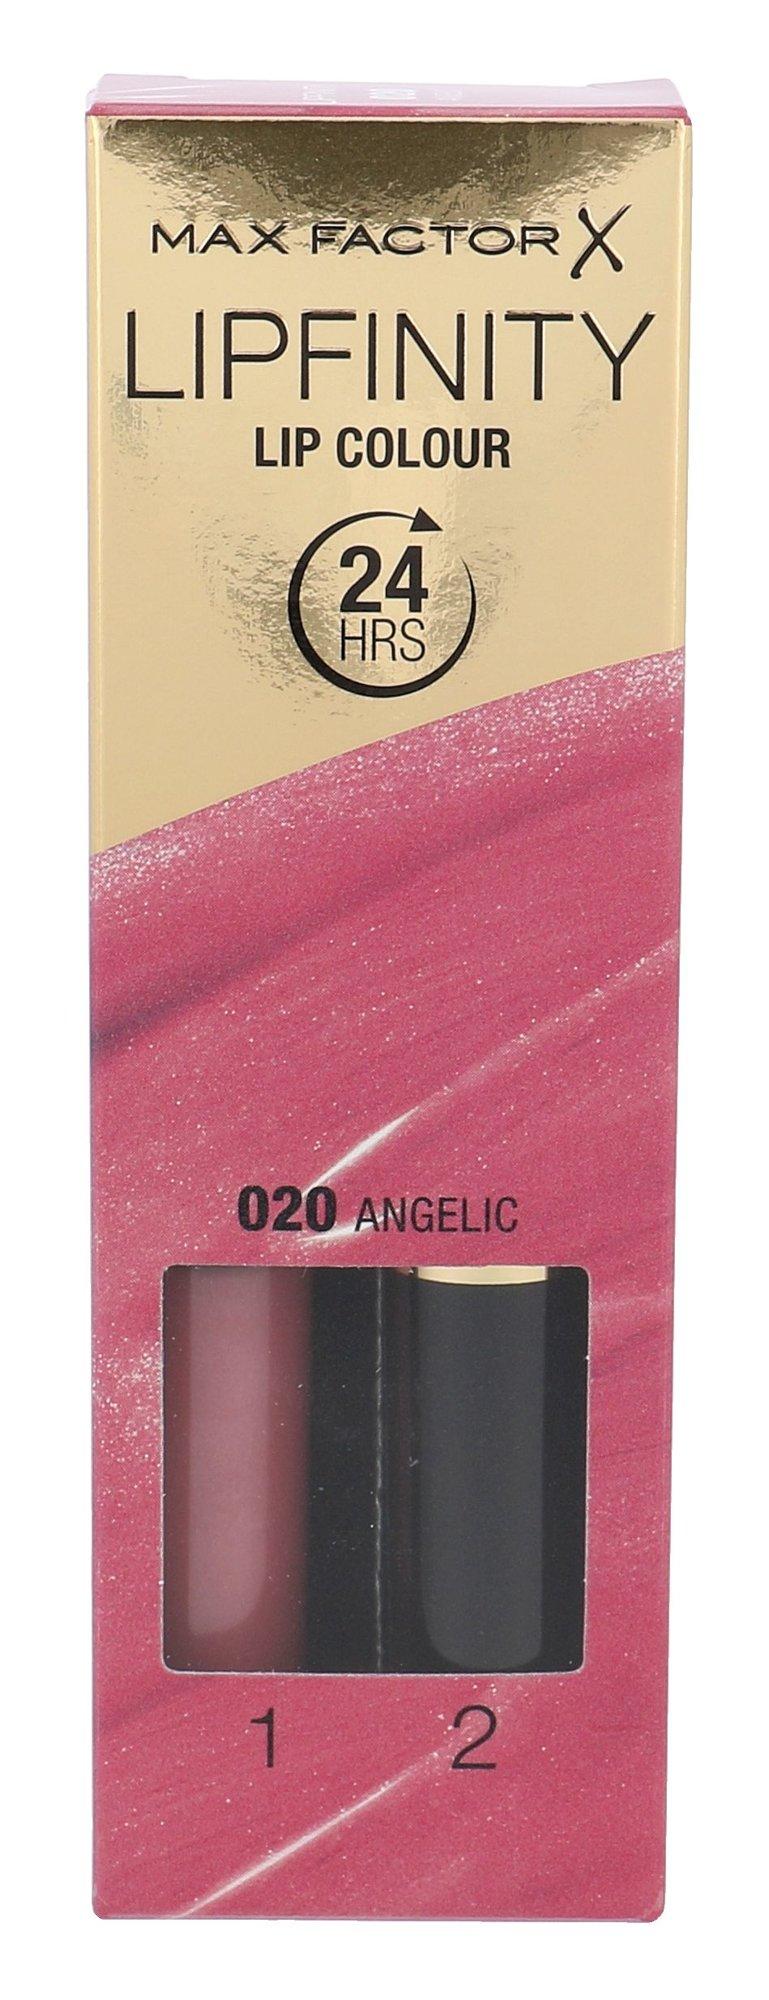 Max Factor Lipfinity Cosmetic 4,2ml 020 Angelic